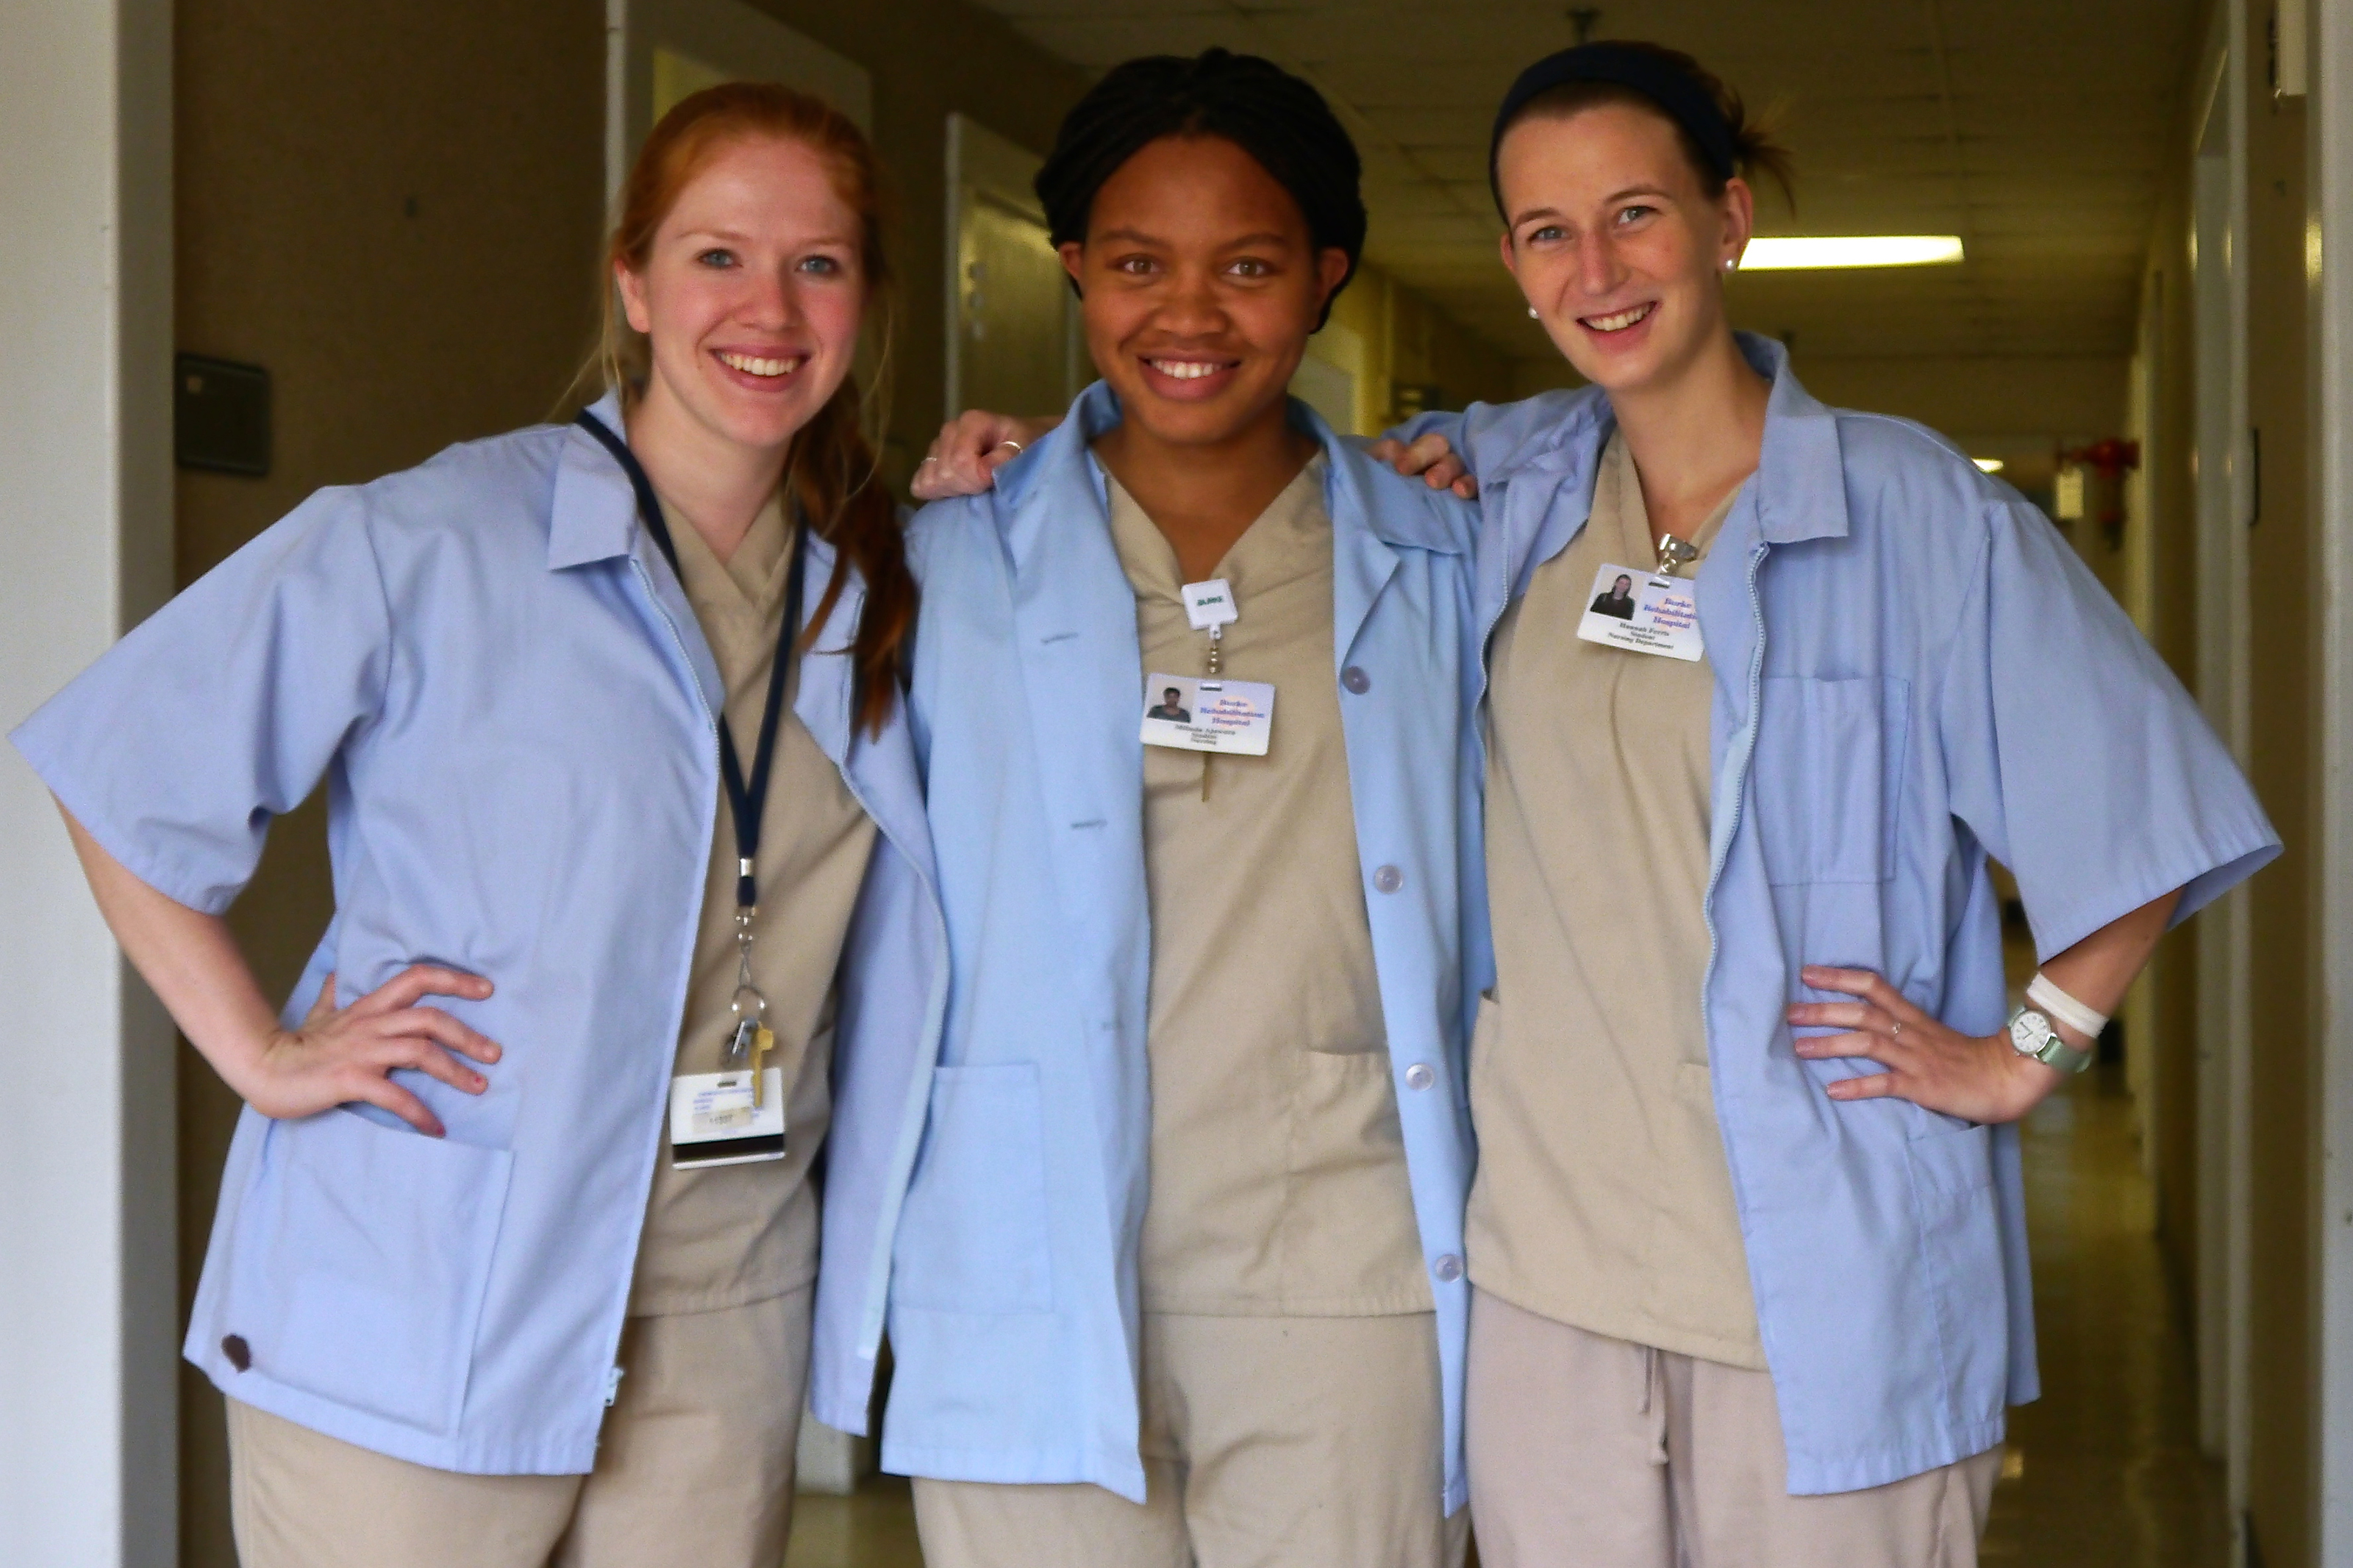 Kate Getman '19, Milinda Ajawara '16 and Hannah Ferris '16 at Burke Rehabilitation Hospital.